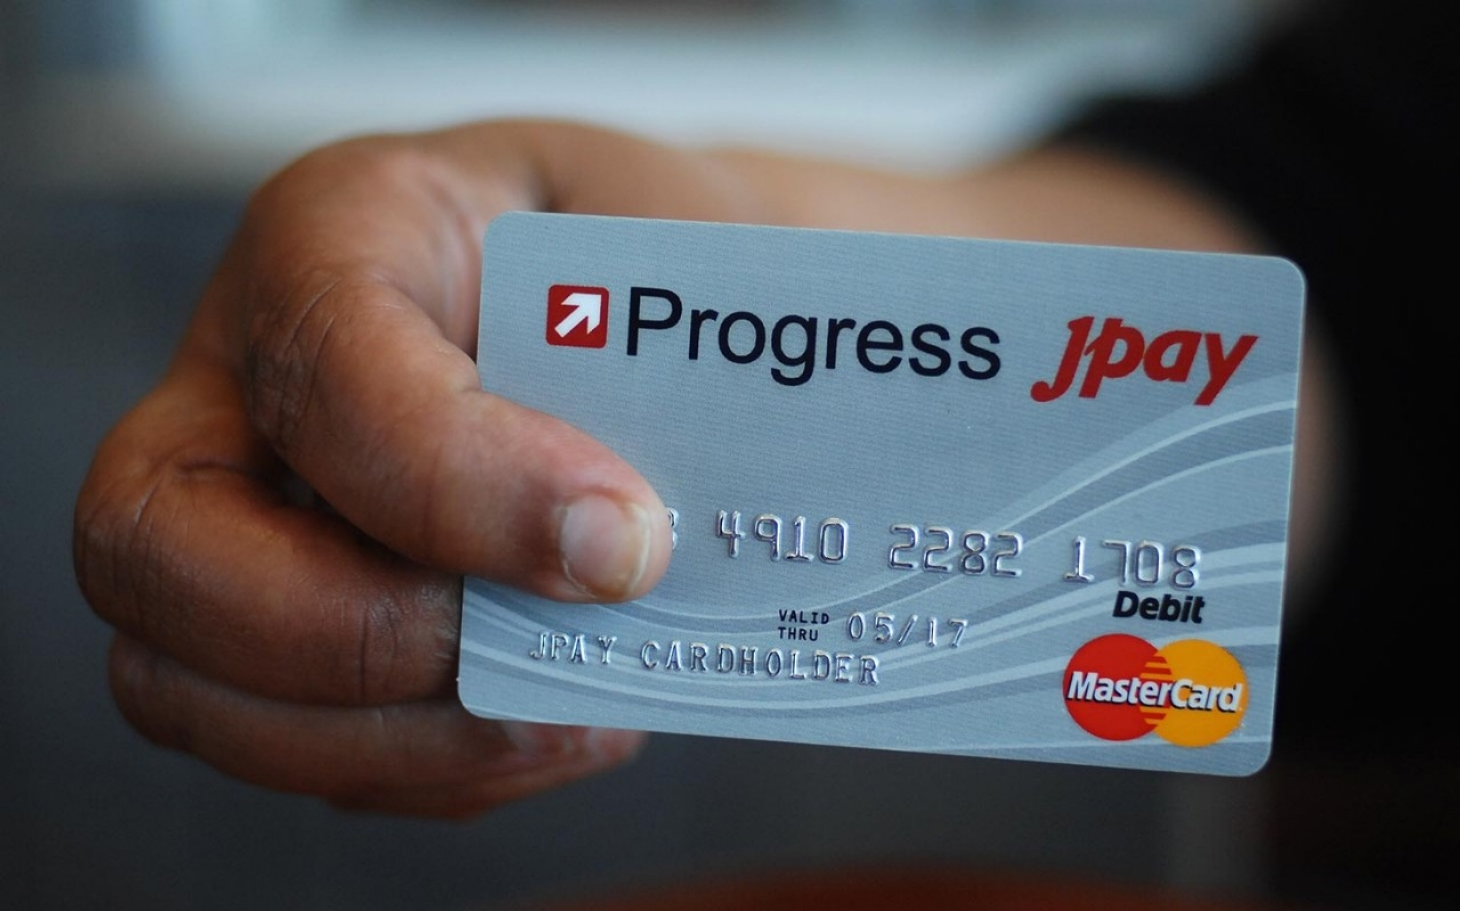 Release Cards Turn Inmates Into Profit Stream | Al Jazeera America